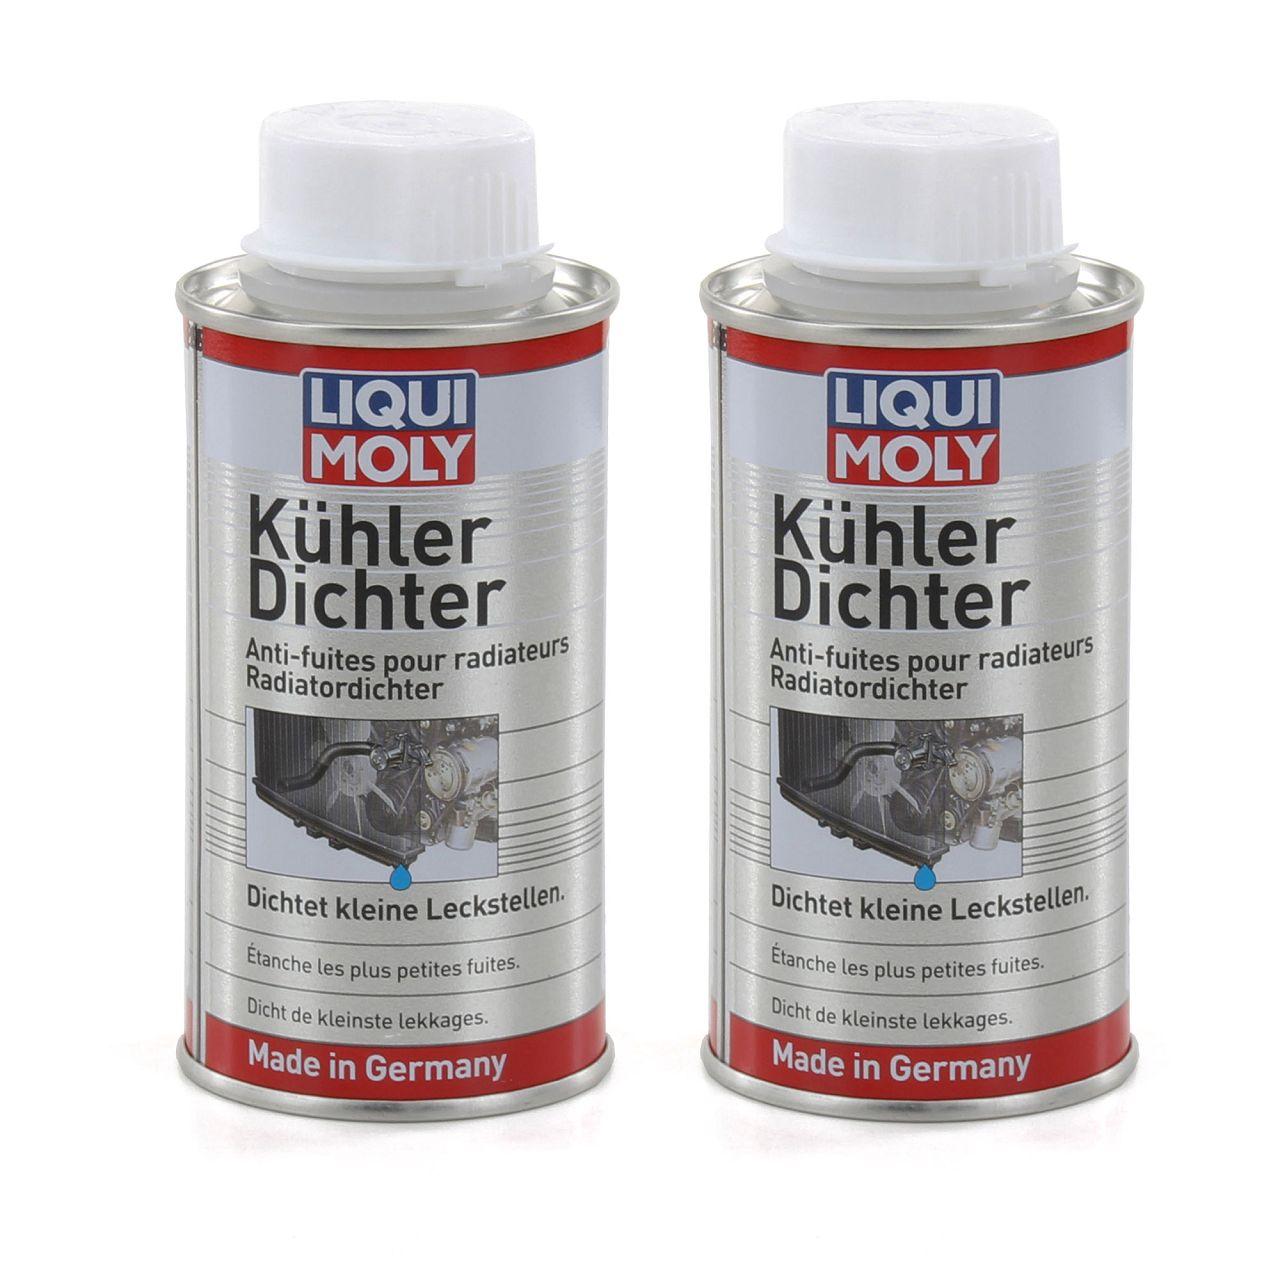 2x 150ml LIQUI MOLY Kühlerdichter Kühler-Dichtmittel-Additiv Dichtungsmittel